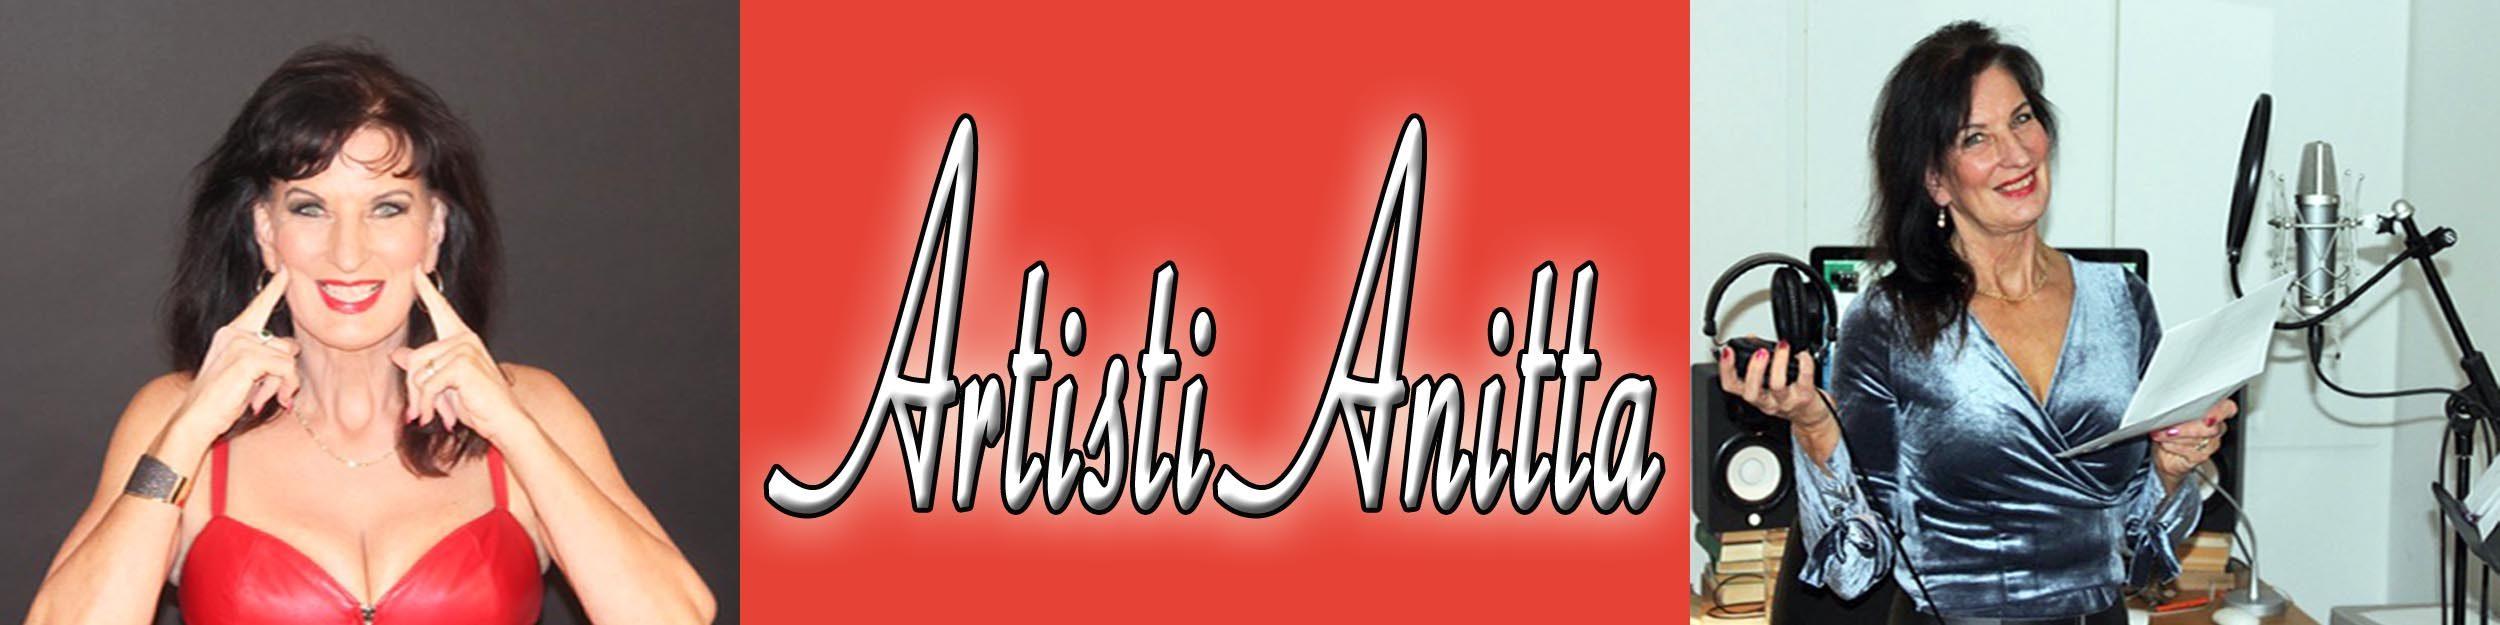 Artisti Anitta